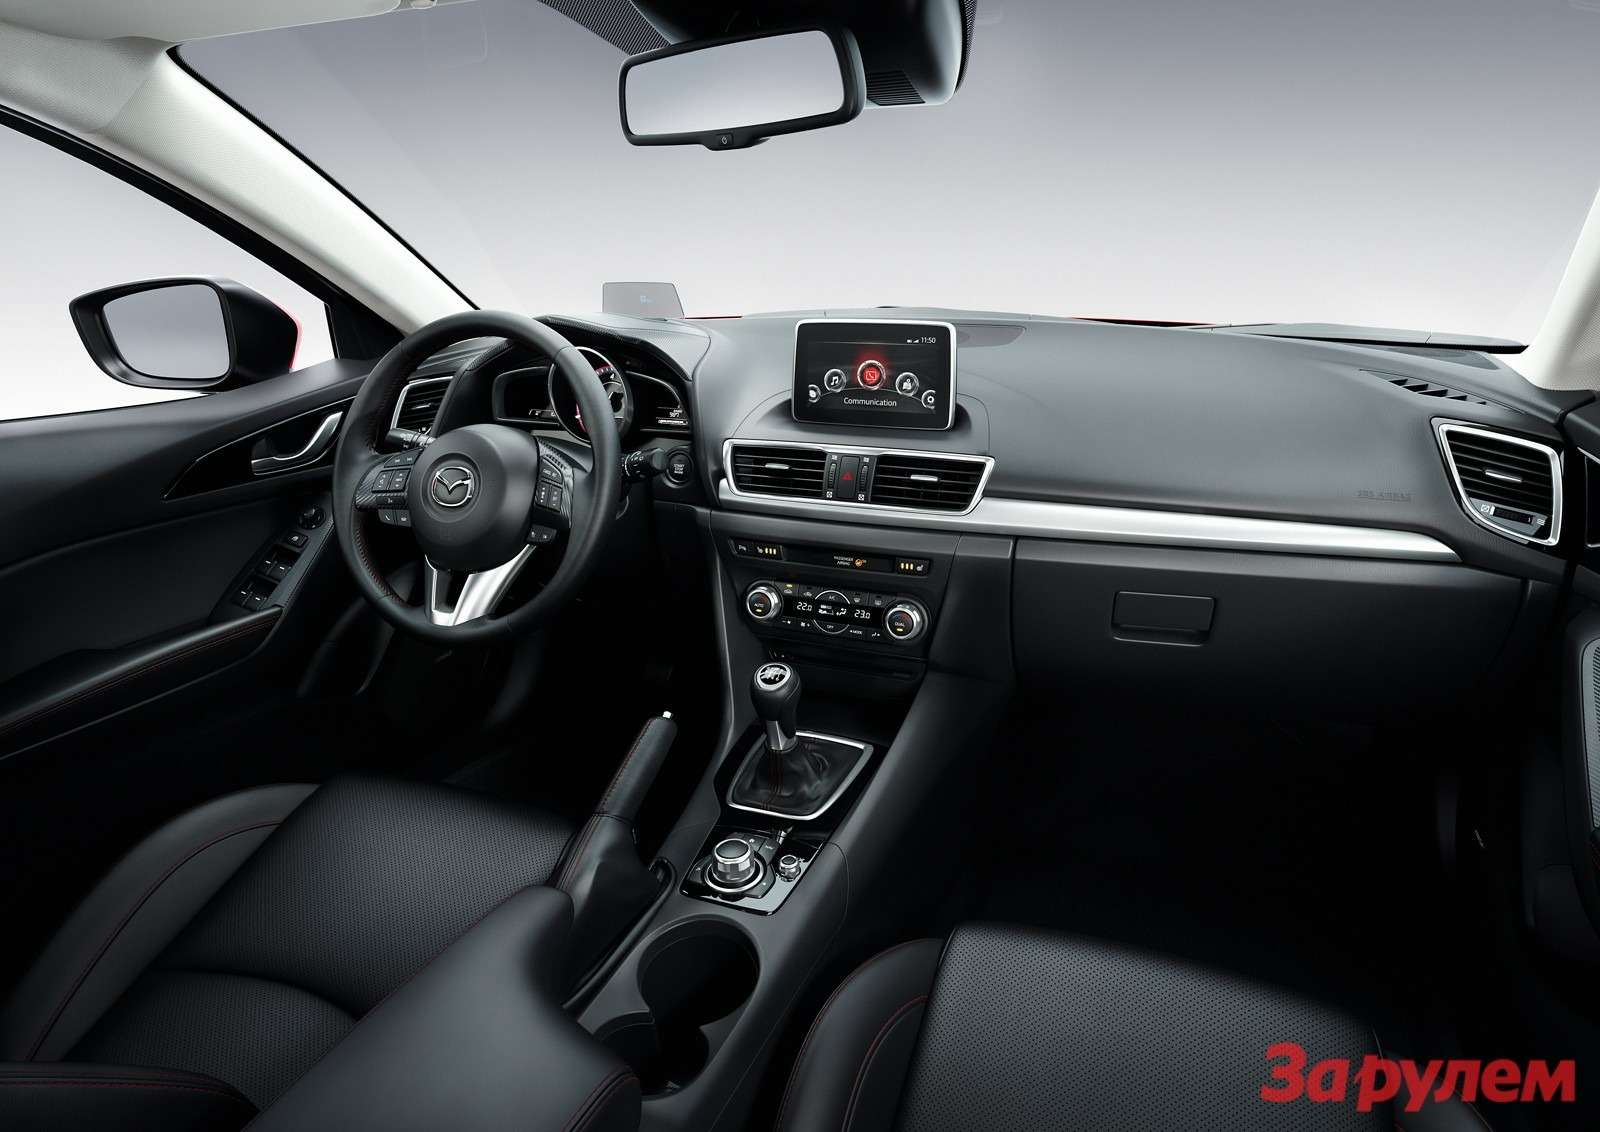 Mazda3 Hatchback 2013 interior 02copy